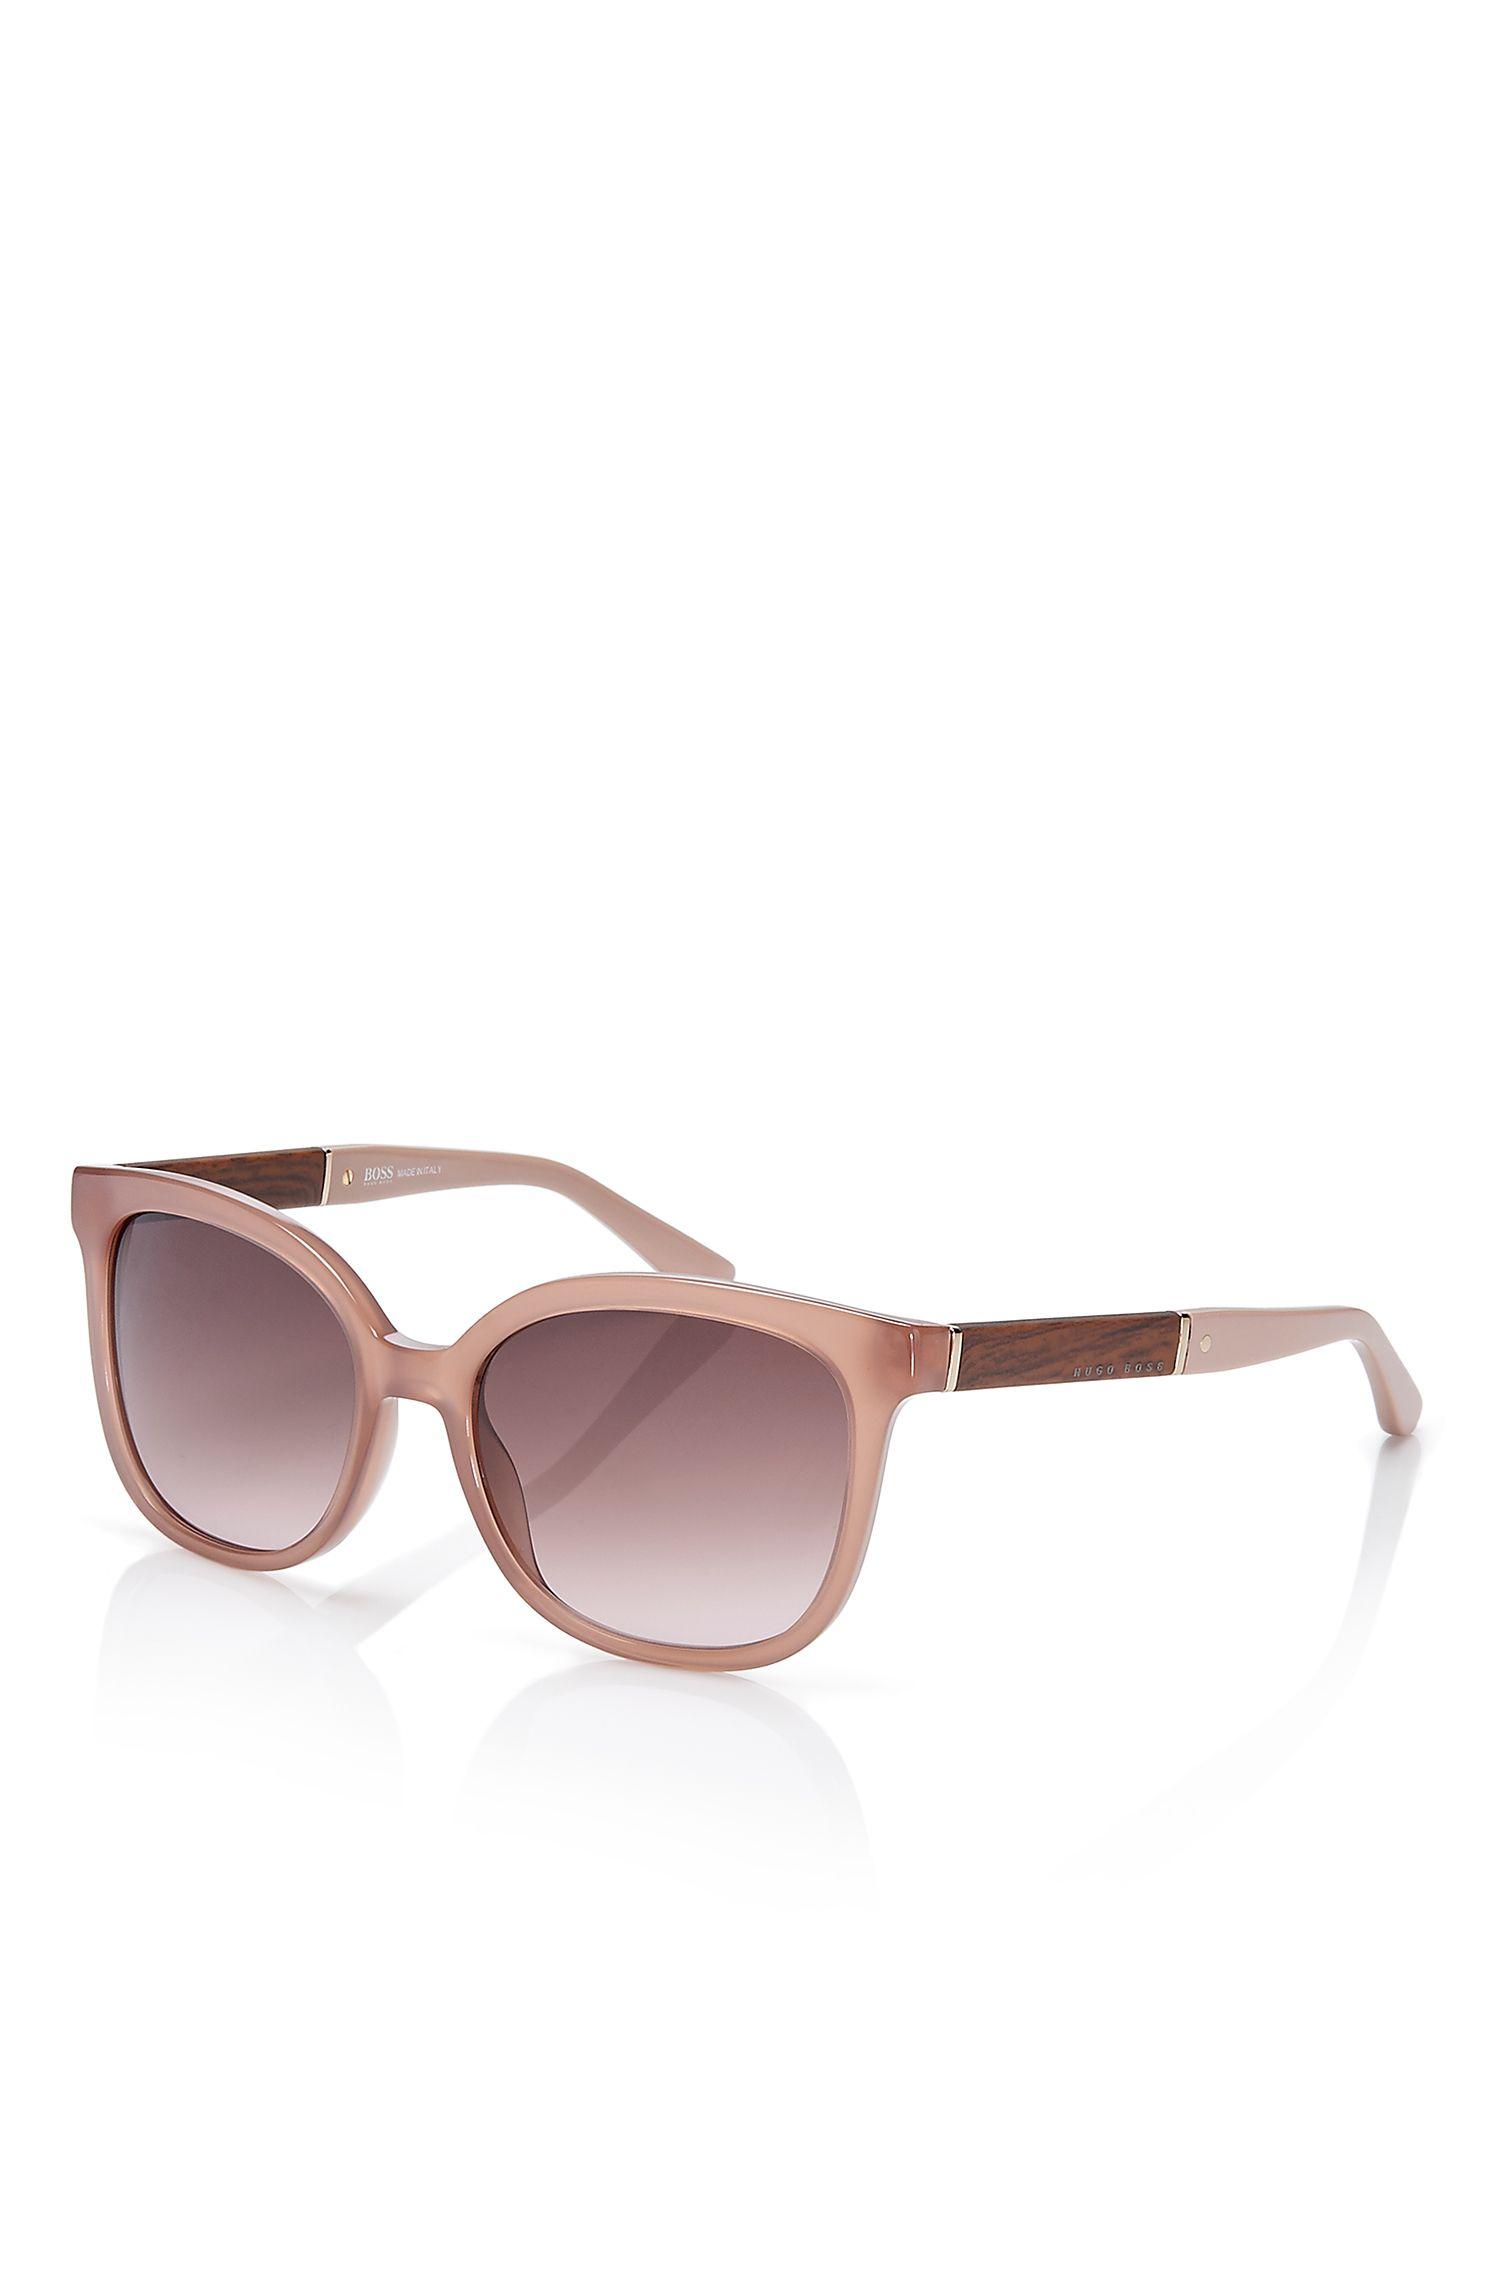 Rectangular Wood Pattern Sunglasses  | BOSS 0663S